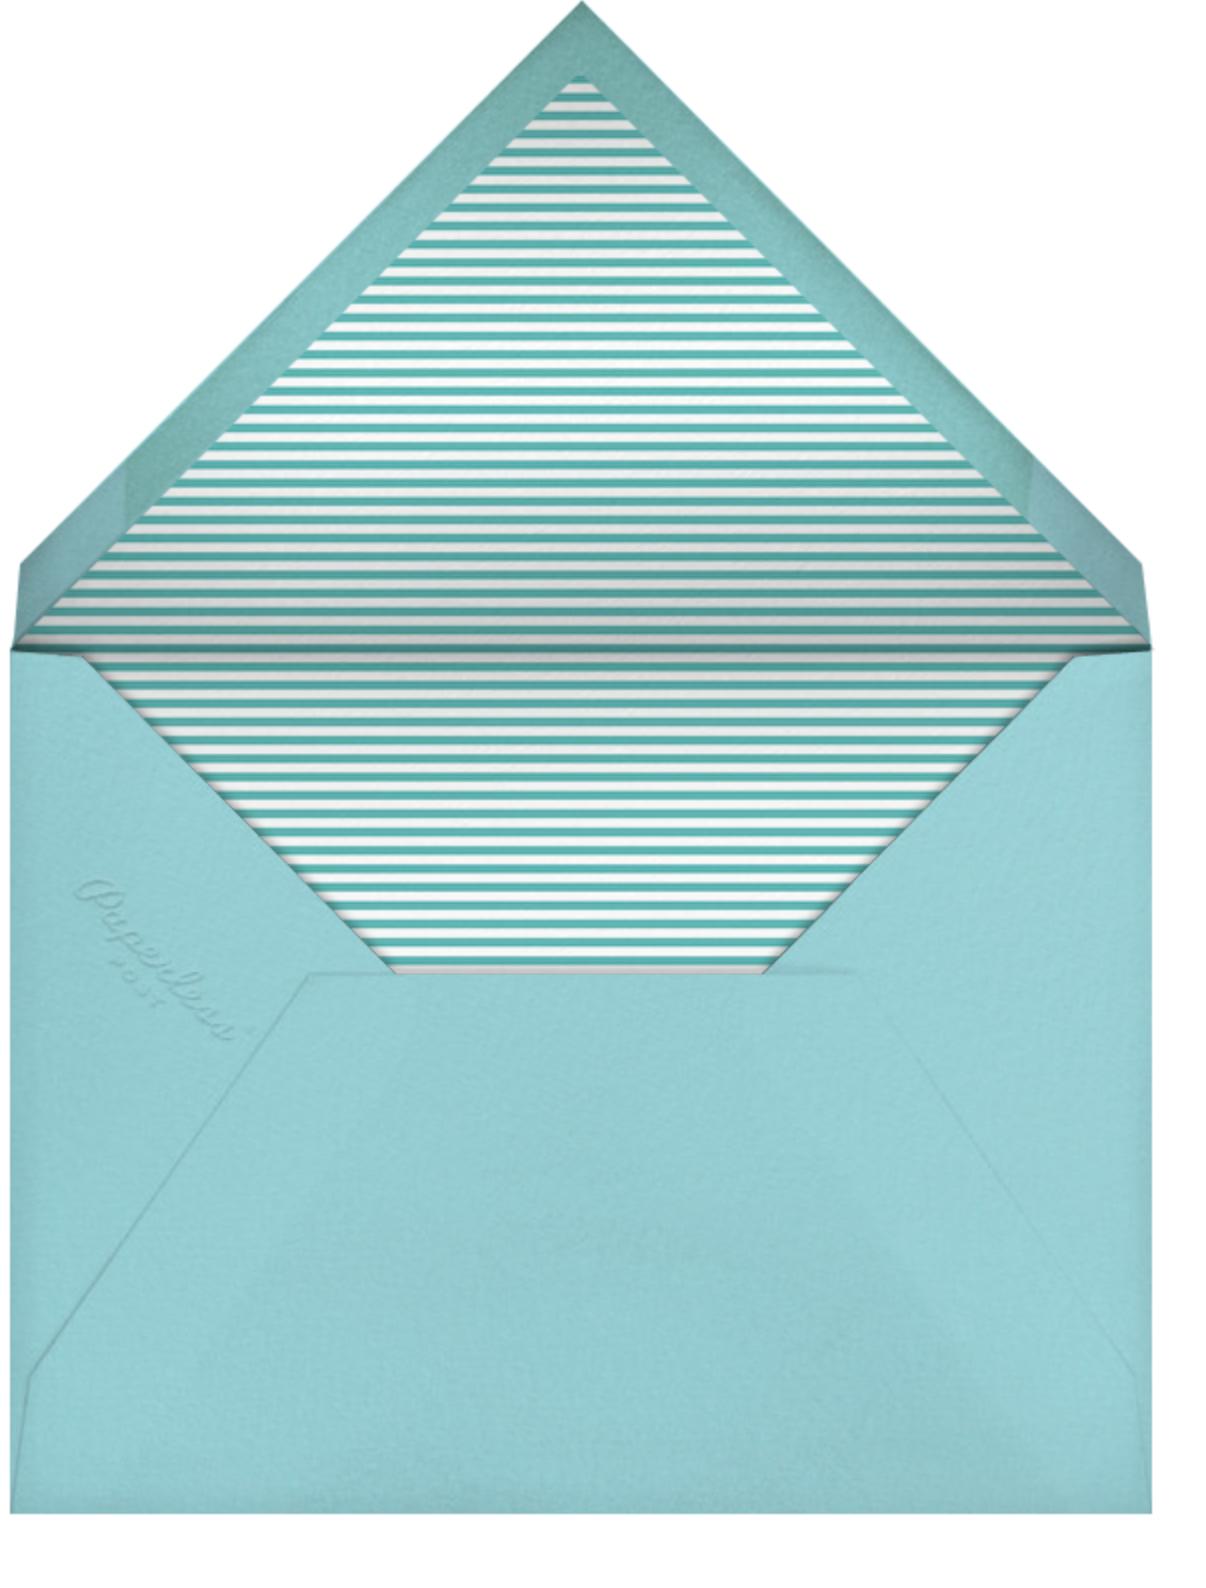 Owl (Stationery) - Petit Collage - Kids' stationery - envelope back